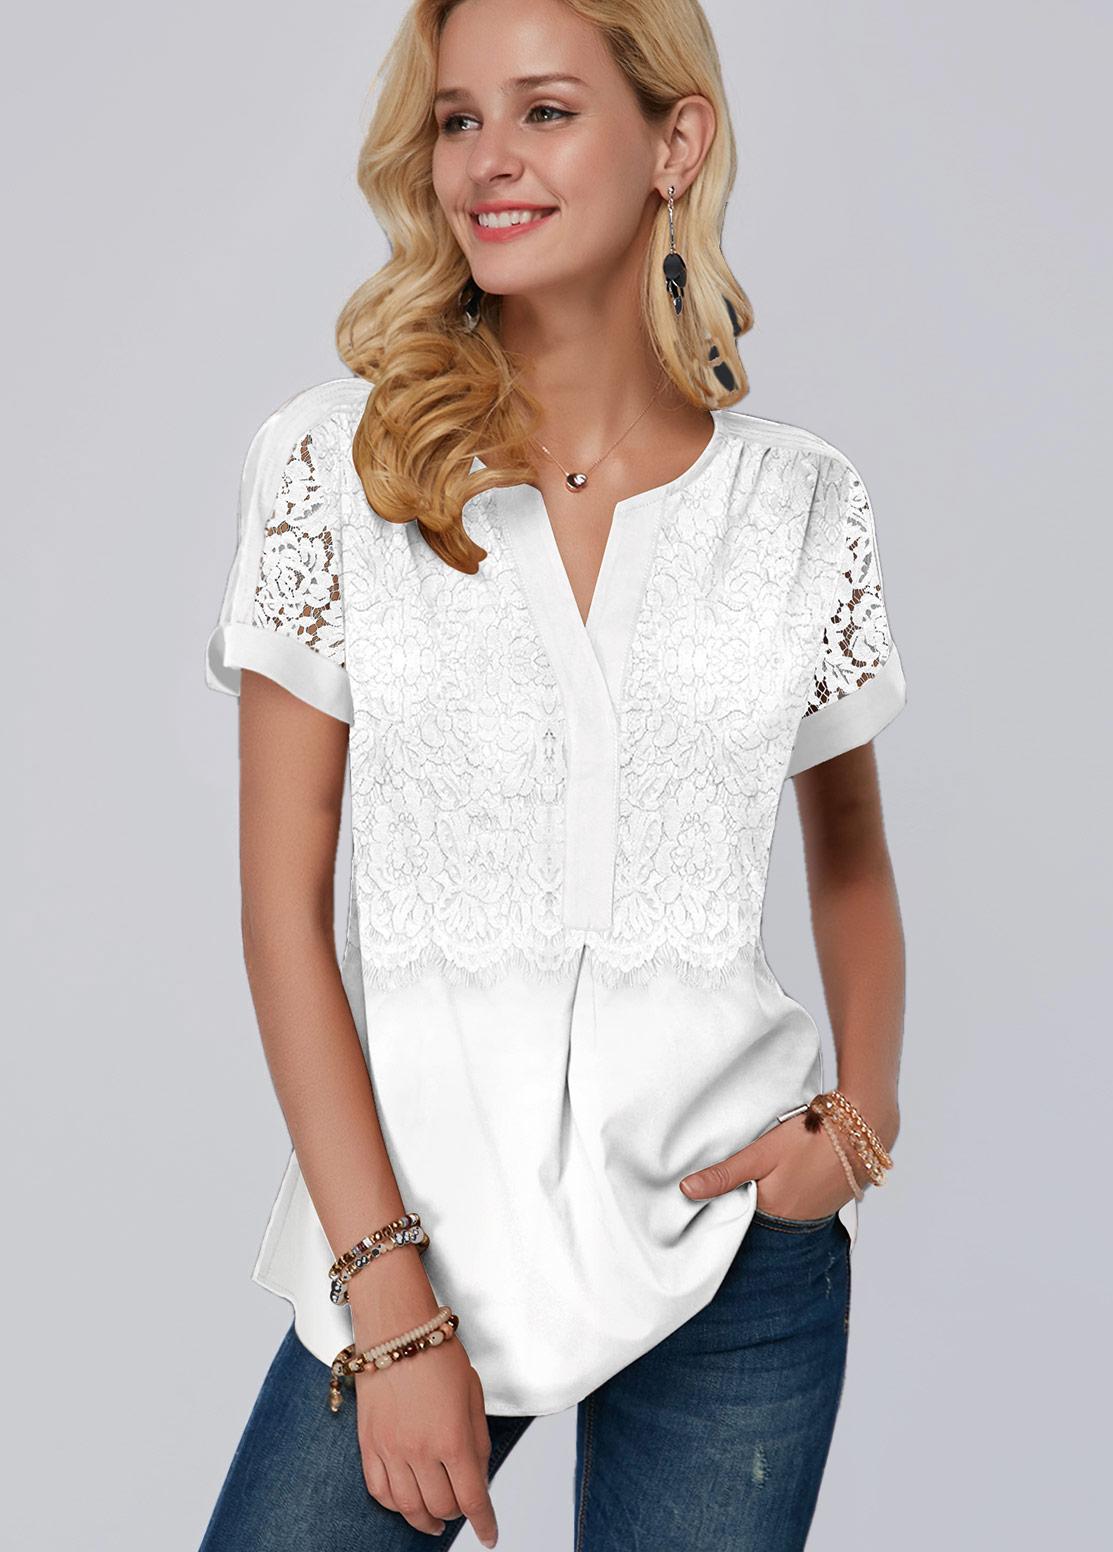 Lace Panel White Short Sleeve Blouse